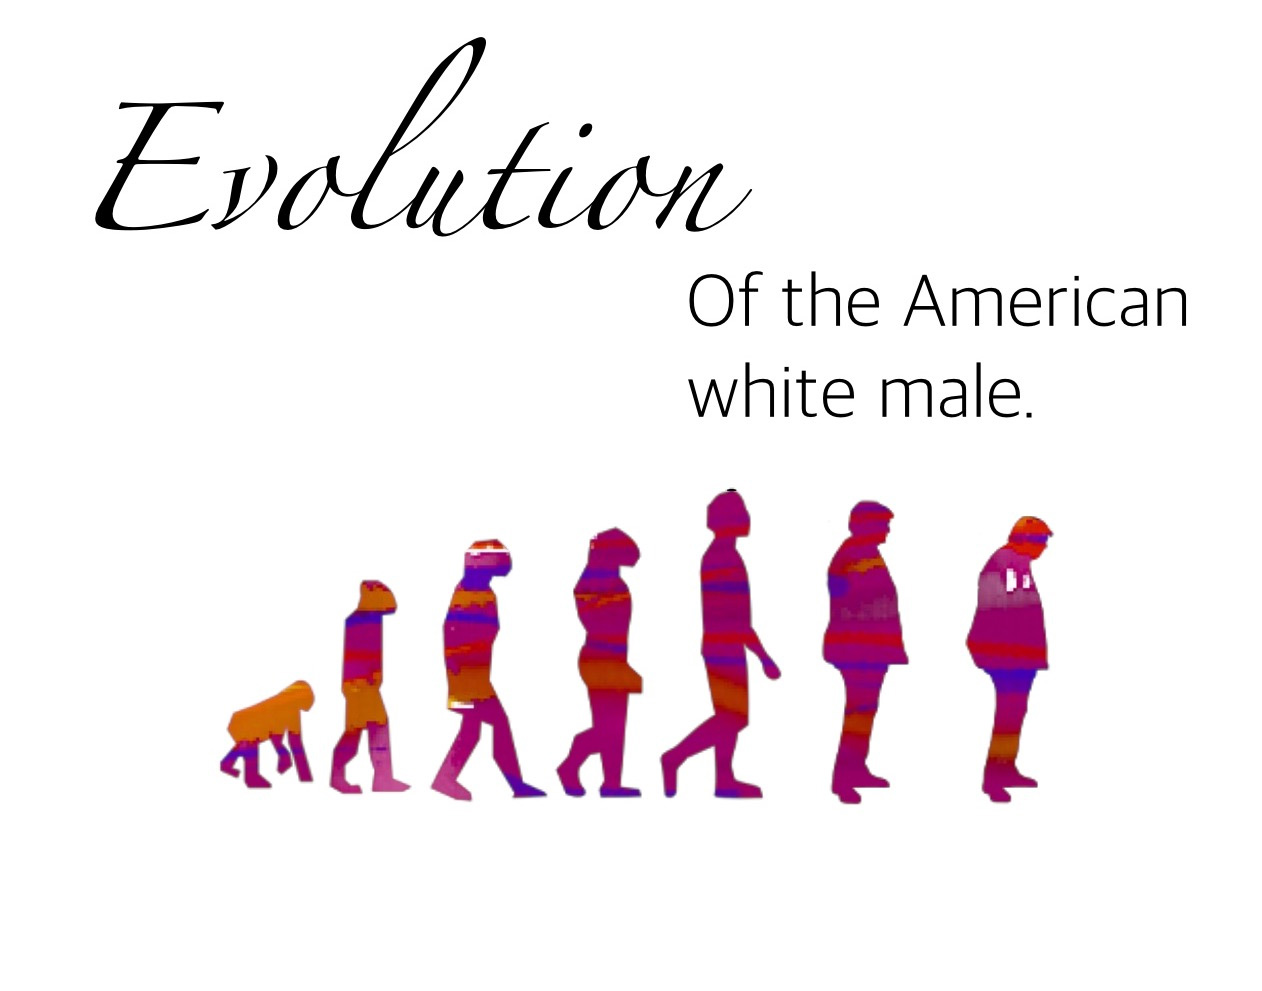 Evolution of the American white male